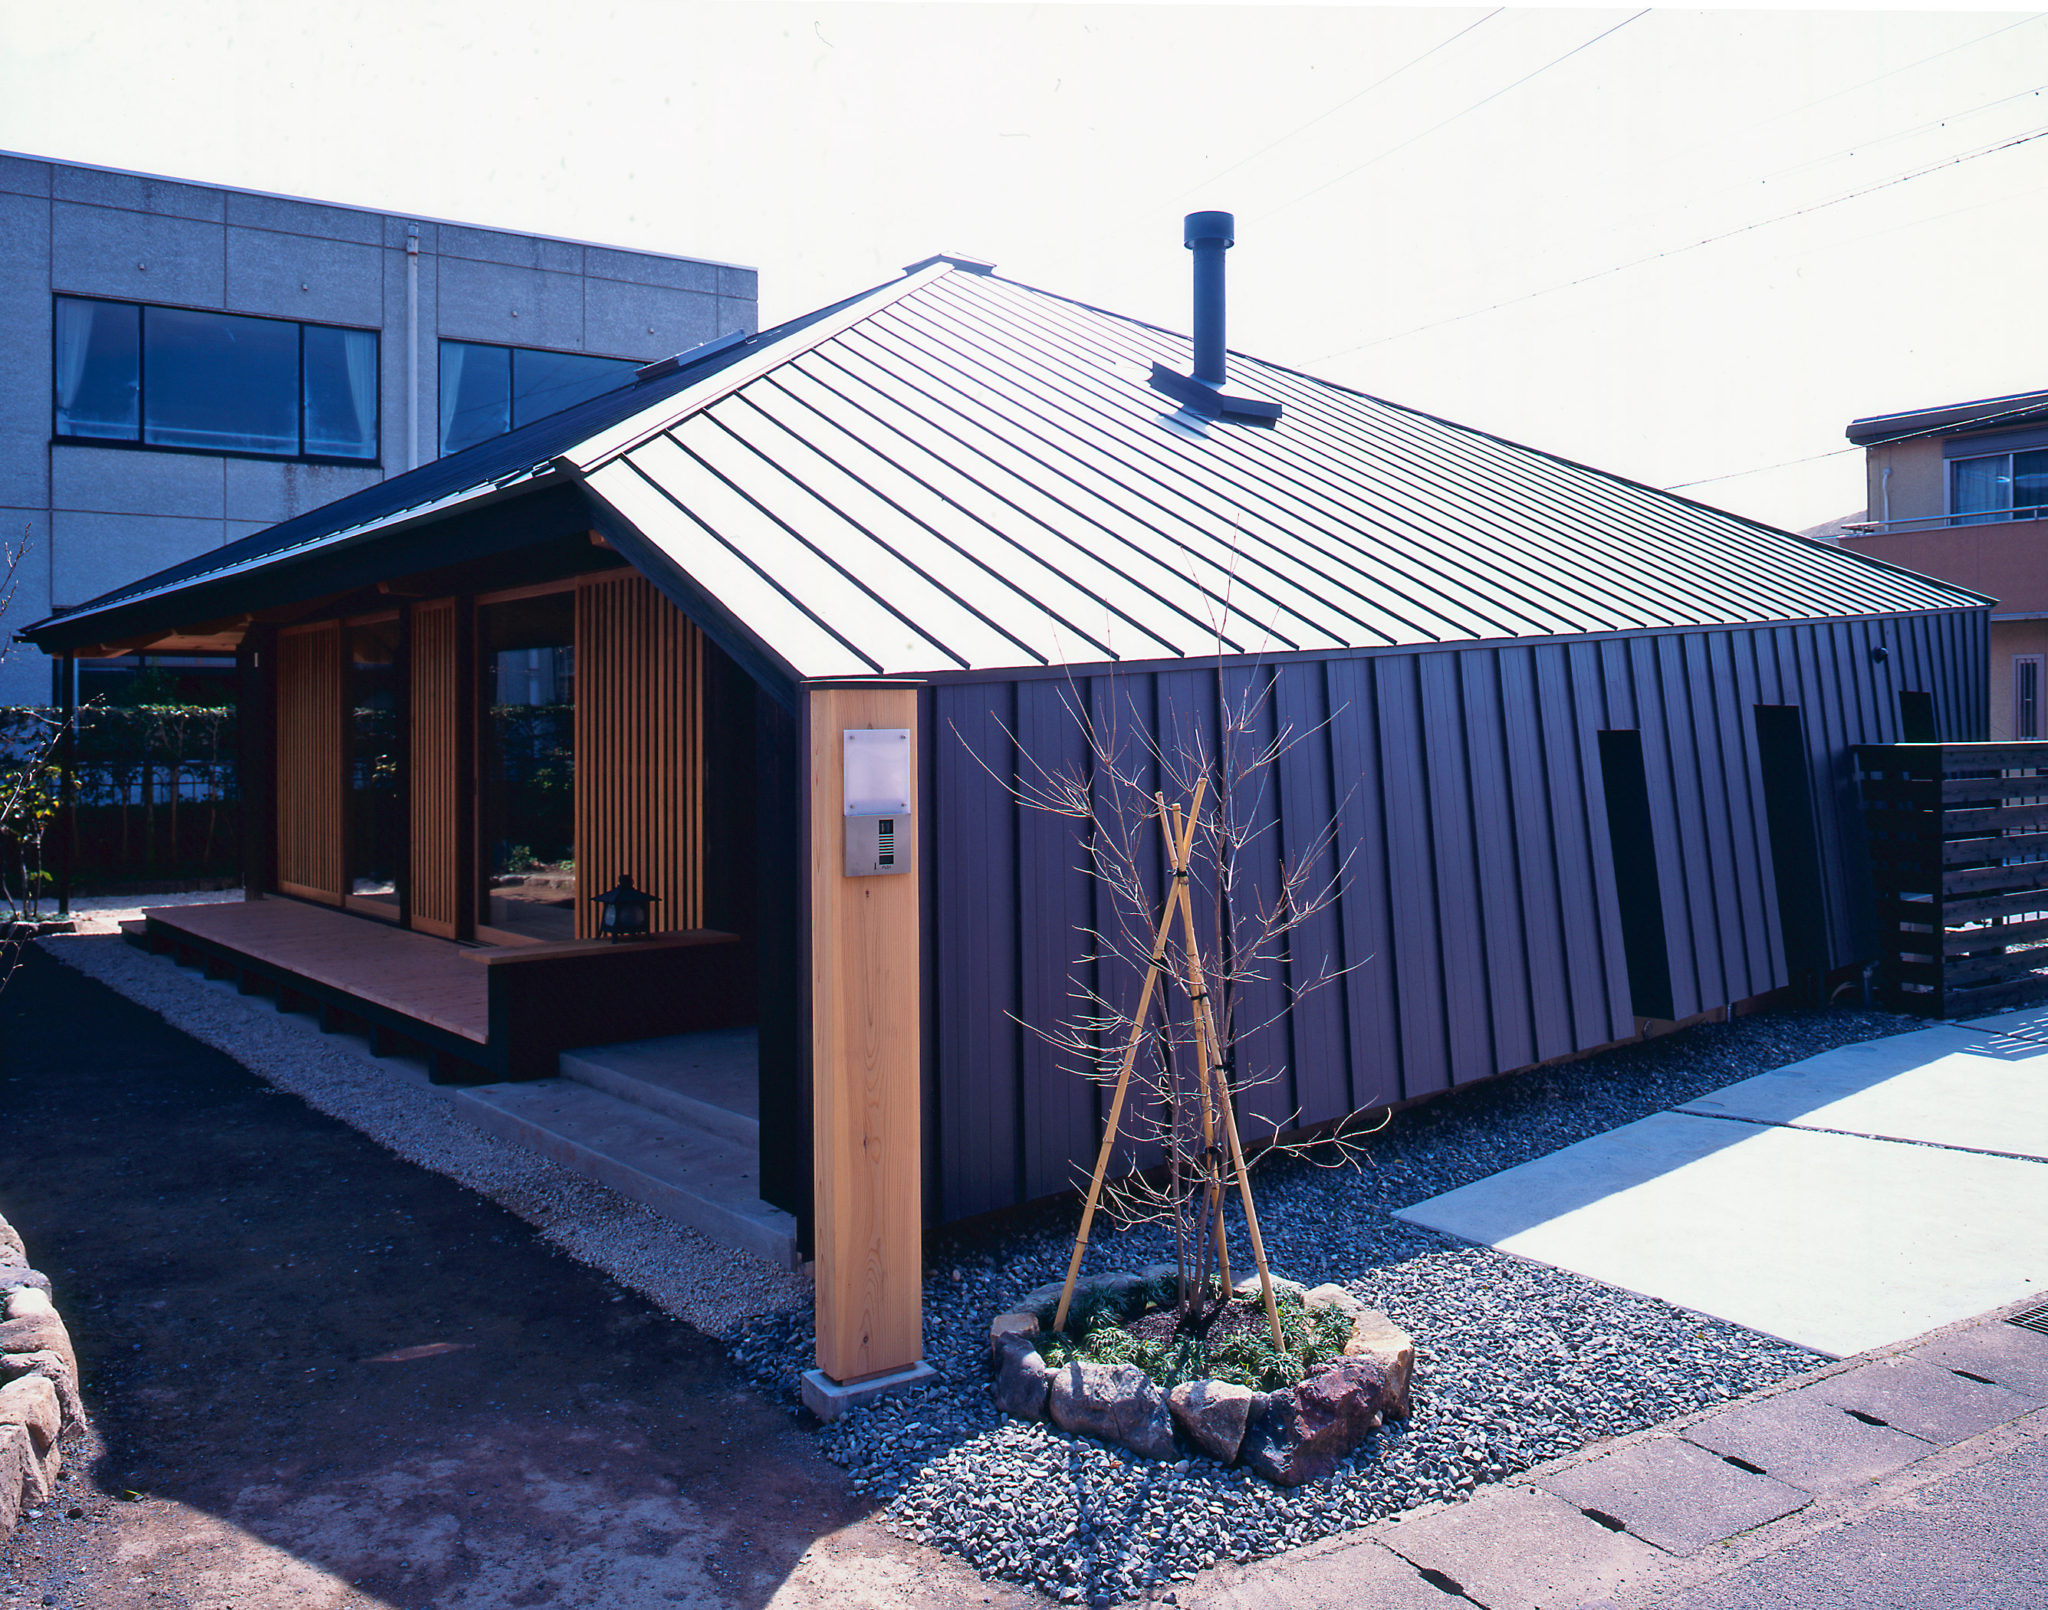 Ms建築設計事務所の変形屋根の傘の家の西側からの外観